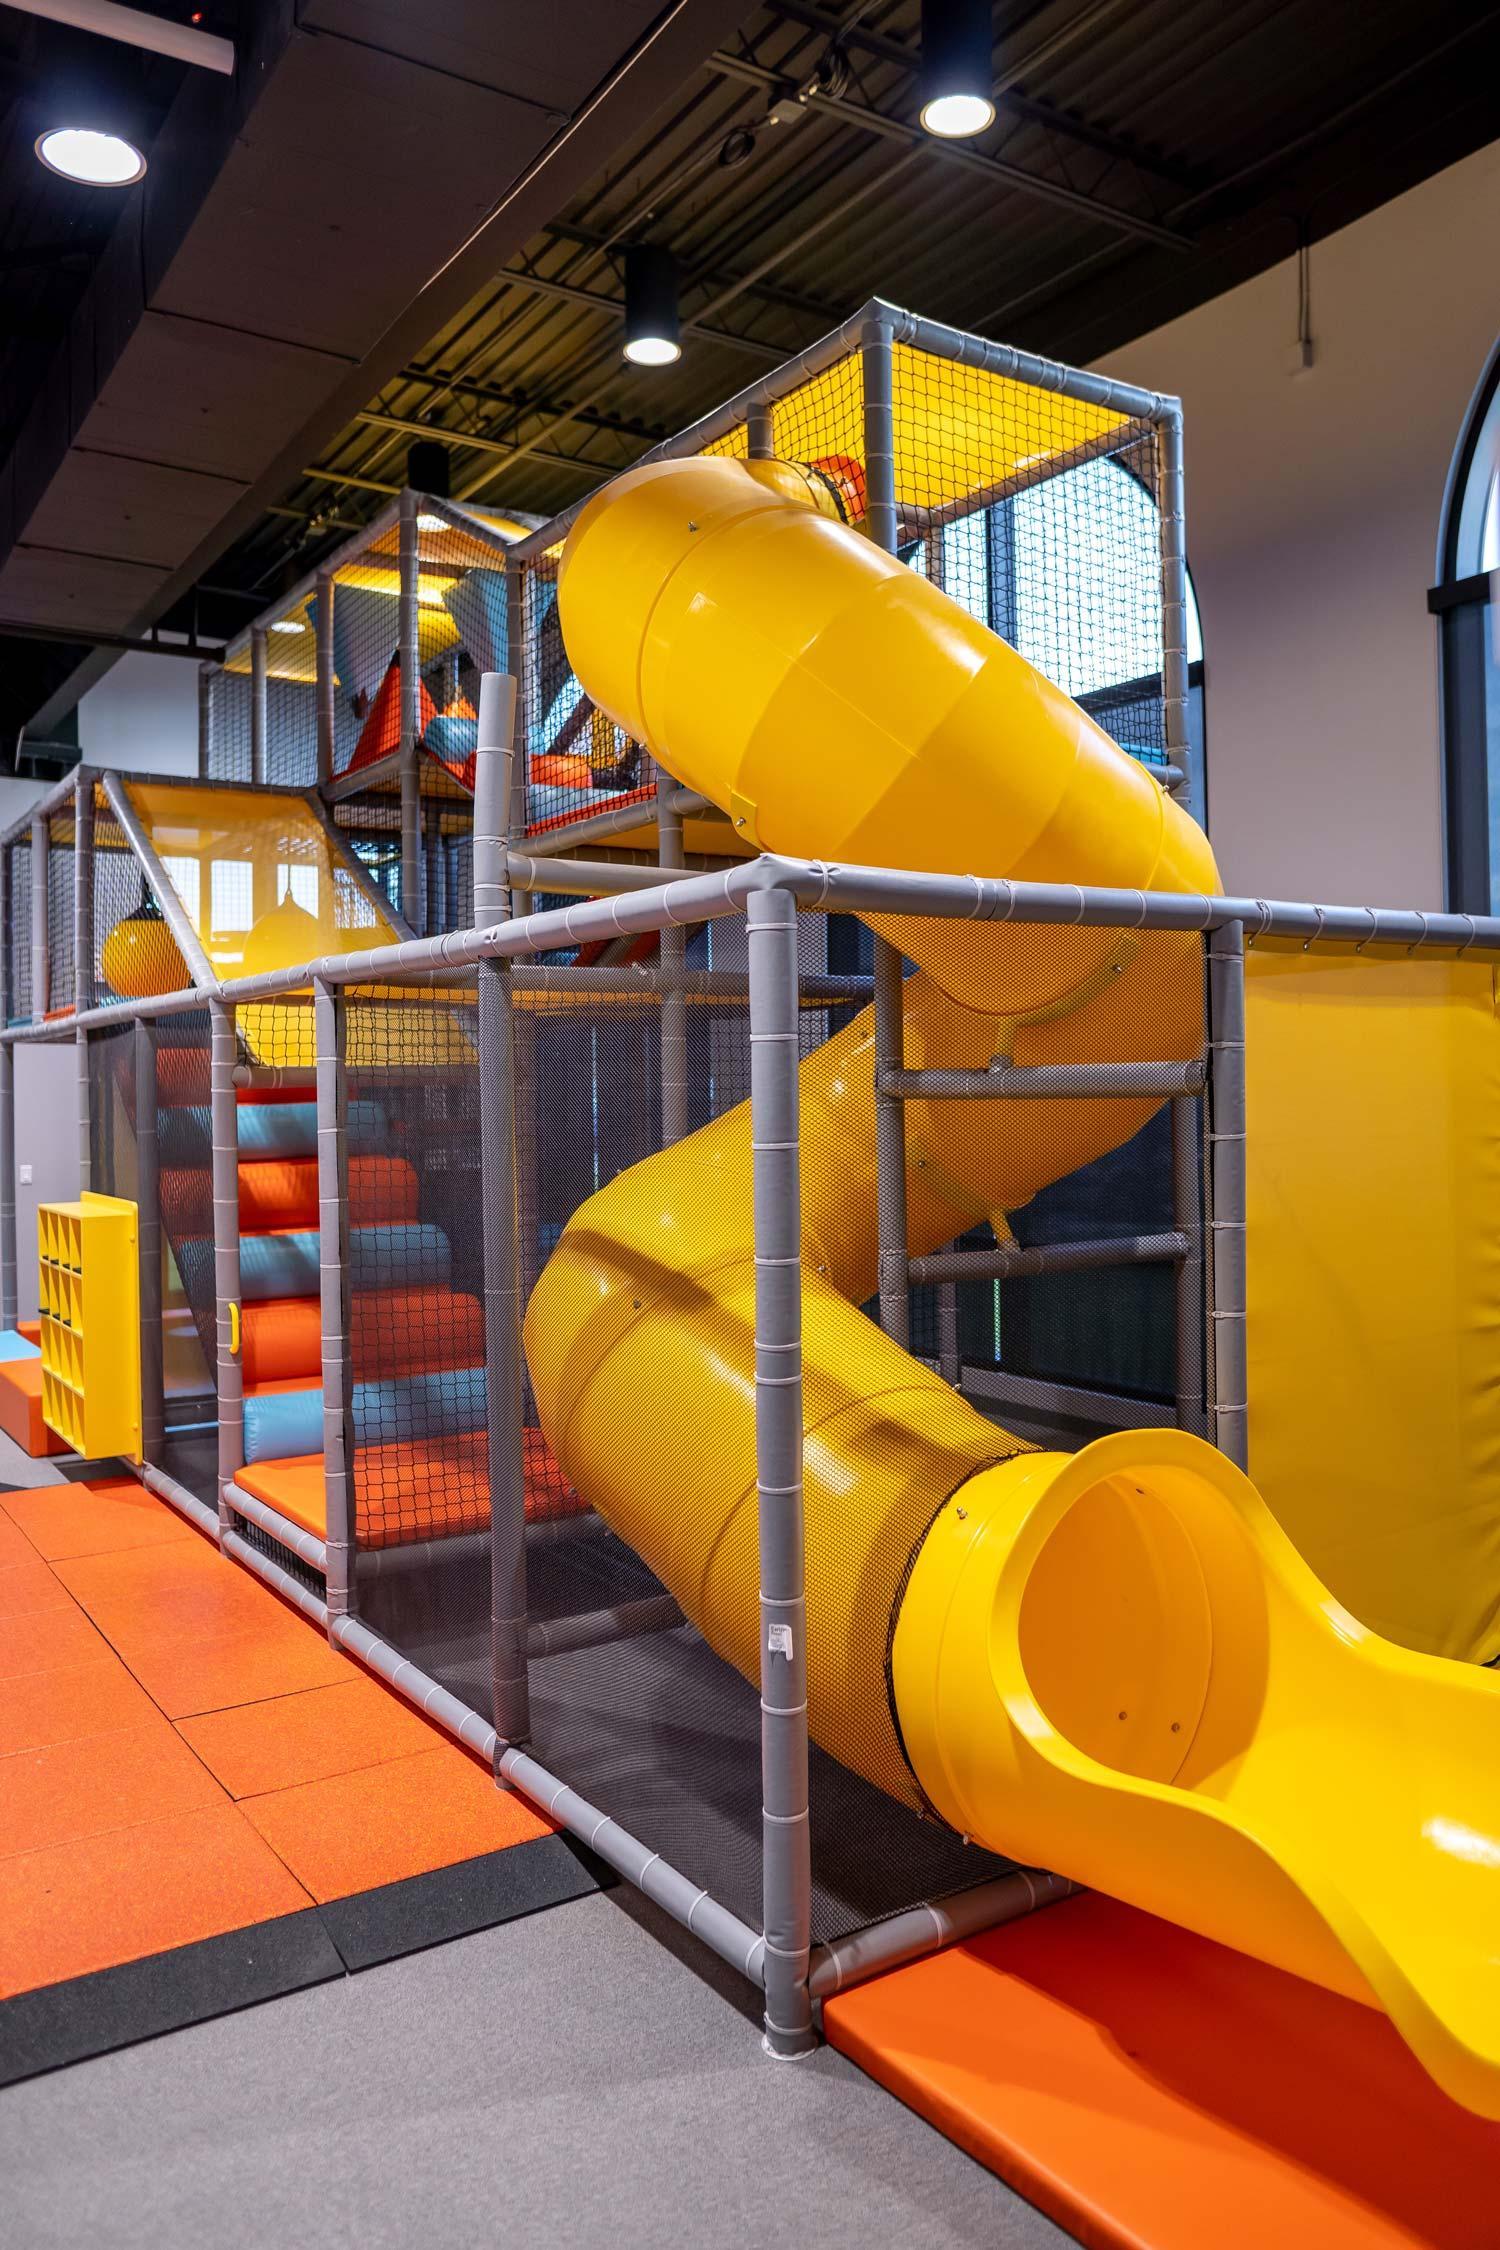 Inspire Church indoor playground